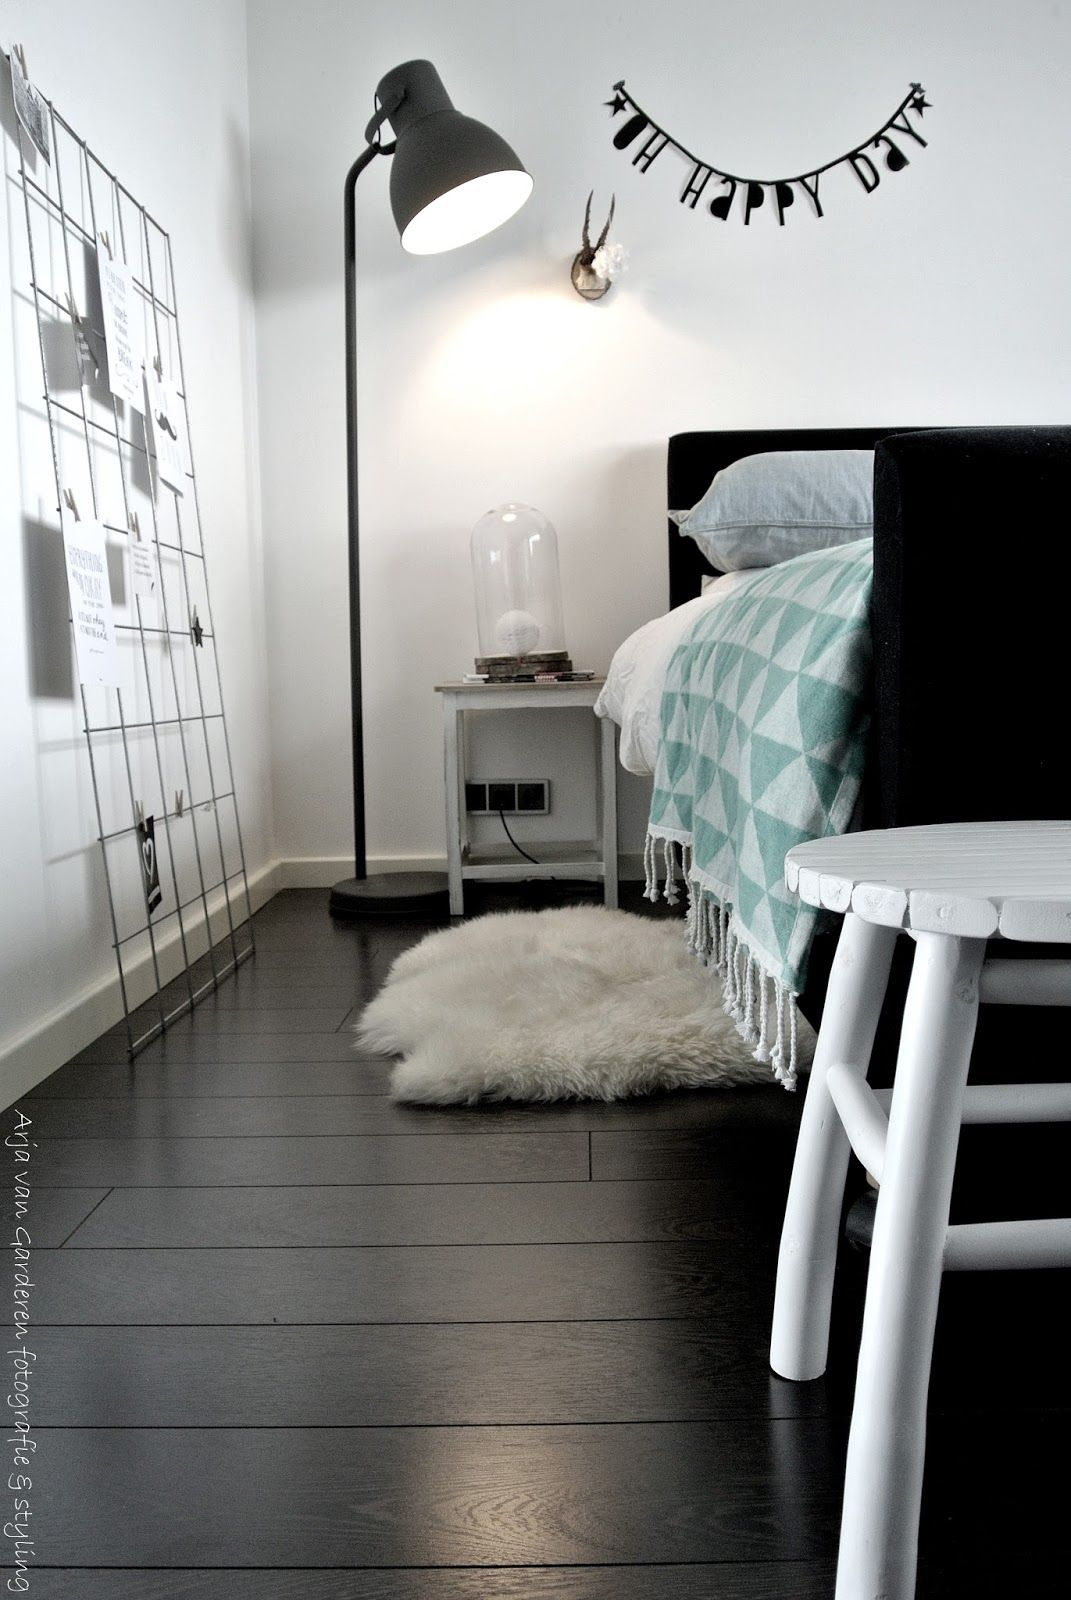 Zwart, wit & hout: Onze slaapkamer | homeStyle | Pinterest | Girl ...